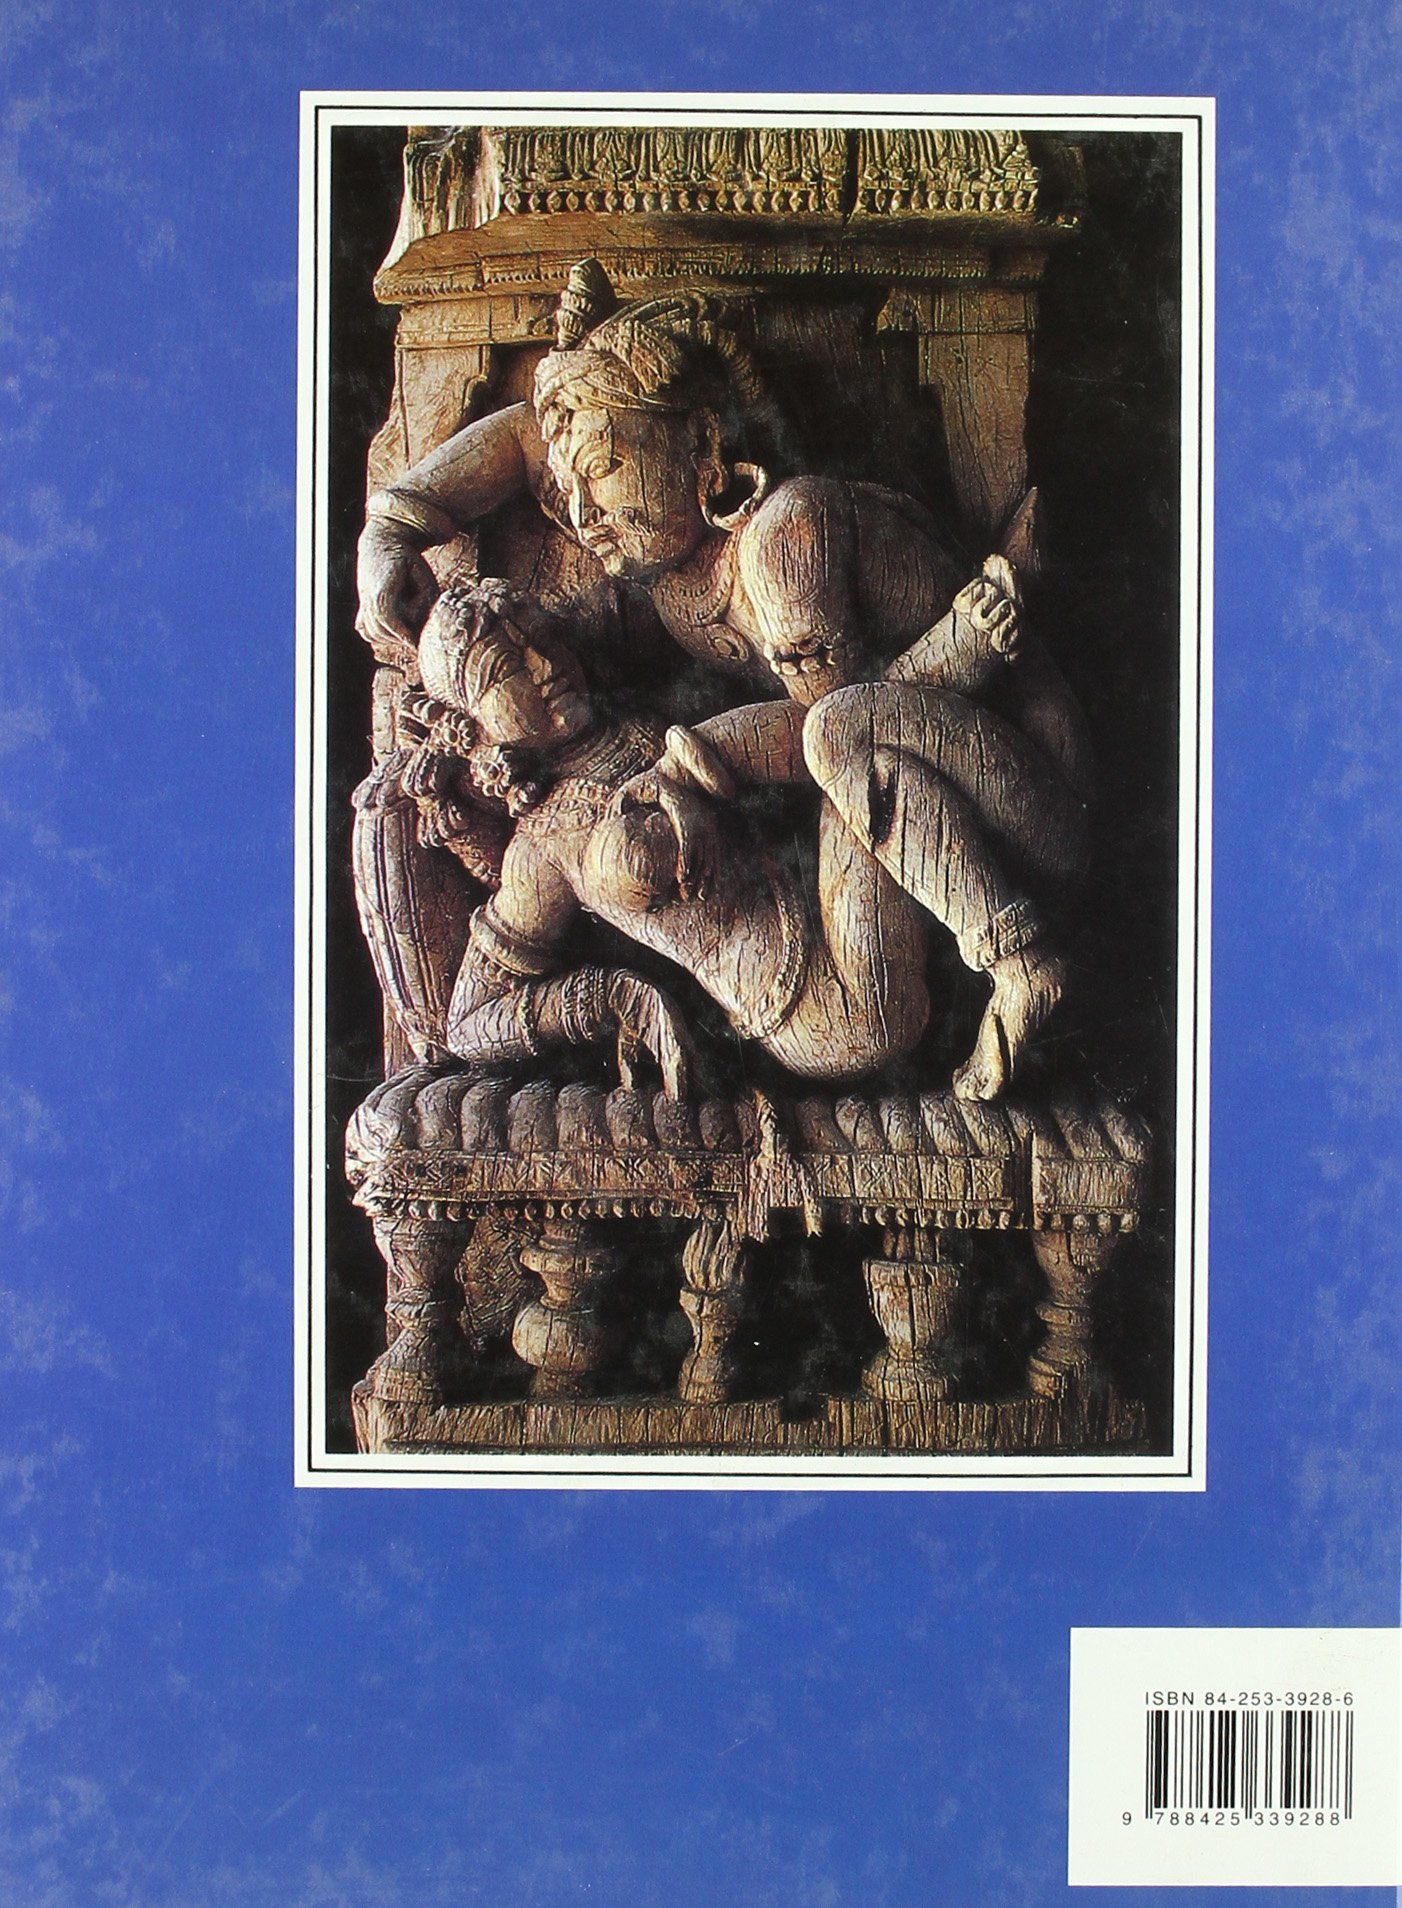 Kama Sutra: Ananga-Ranga. El jardín perfumado PAREJA Y SEXUALIDAD: Amazon.es: Anonimo: Libros